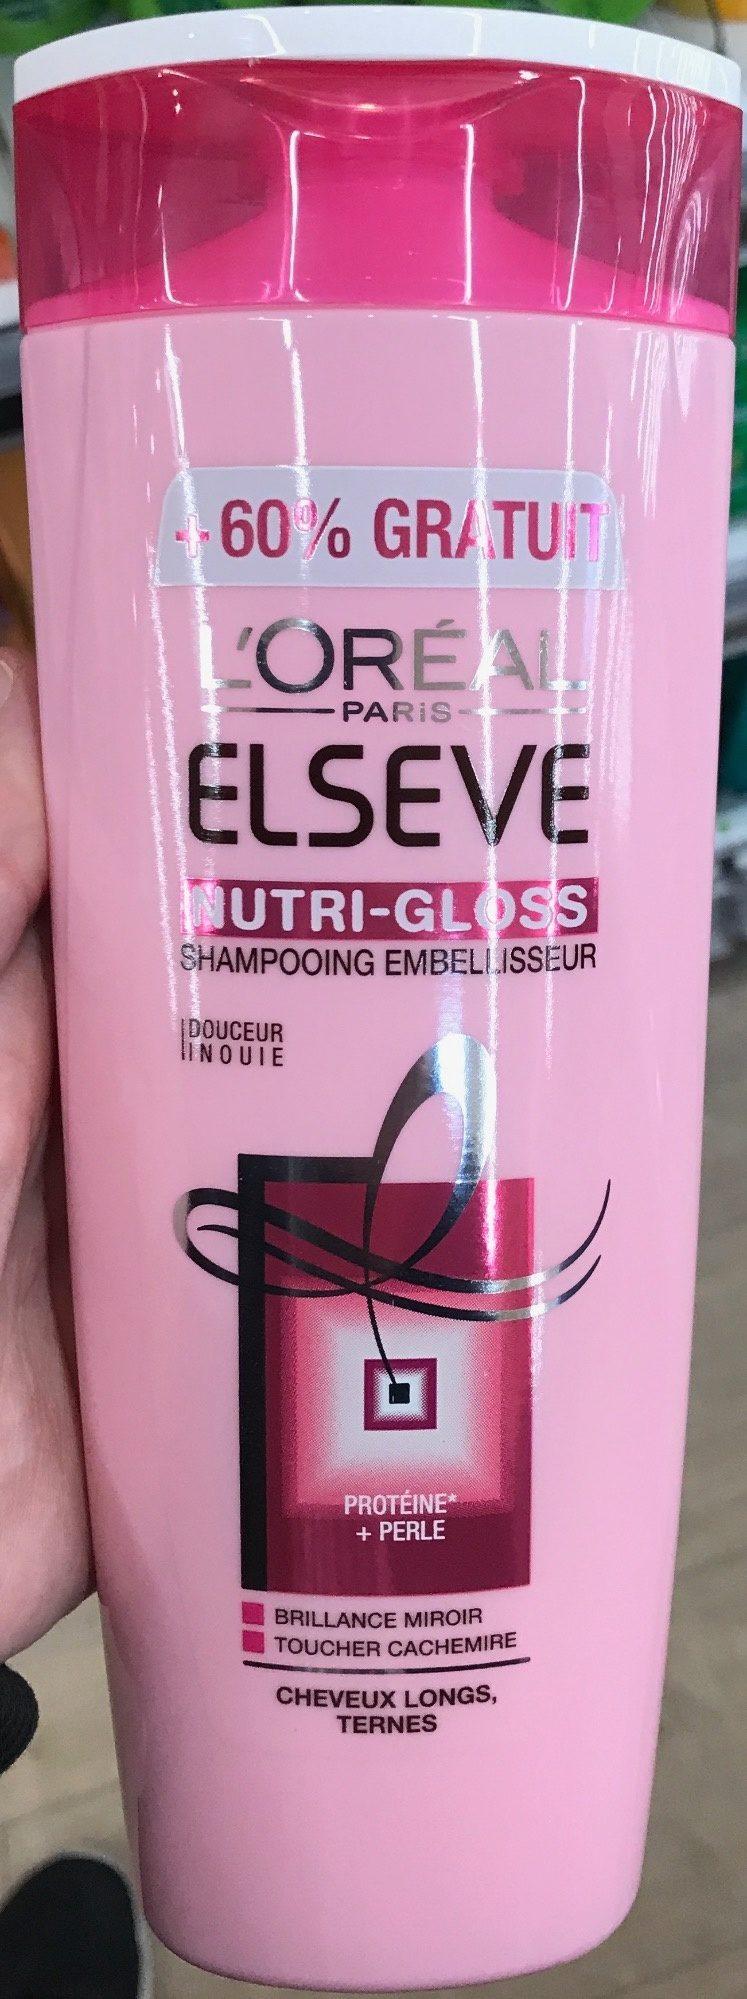 Elseve Nutri-Gloss (+60% gratuit) - Product - fr